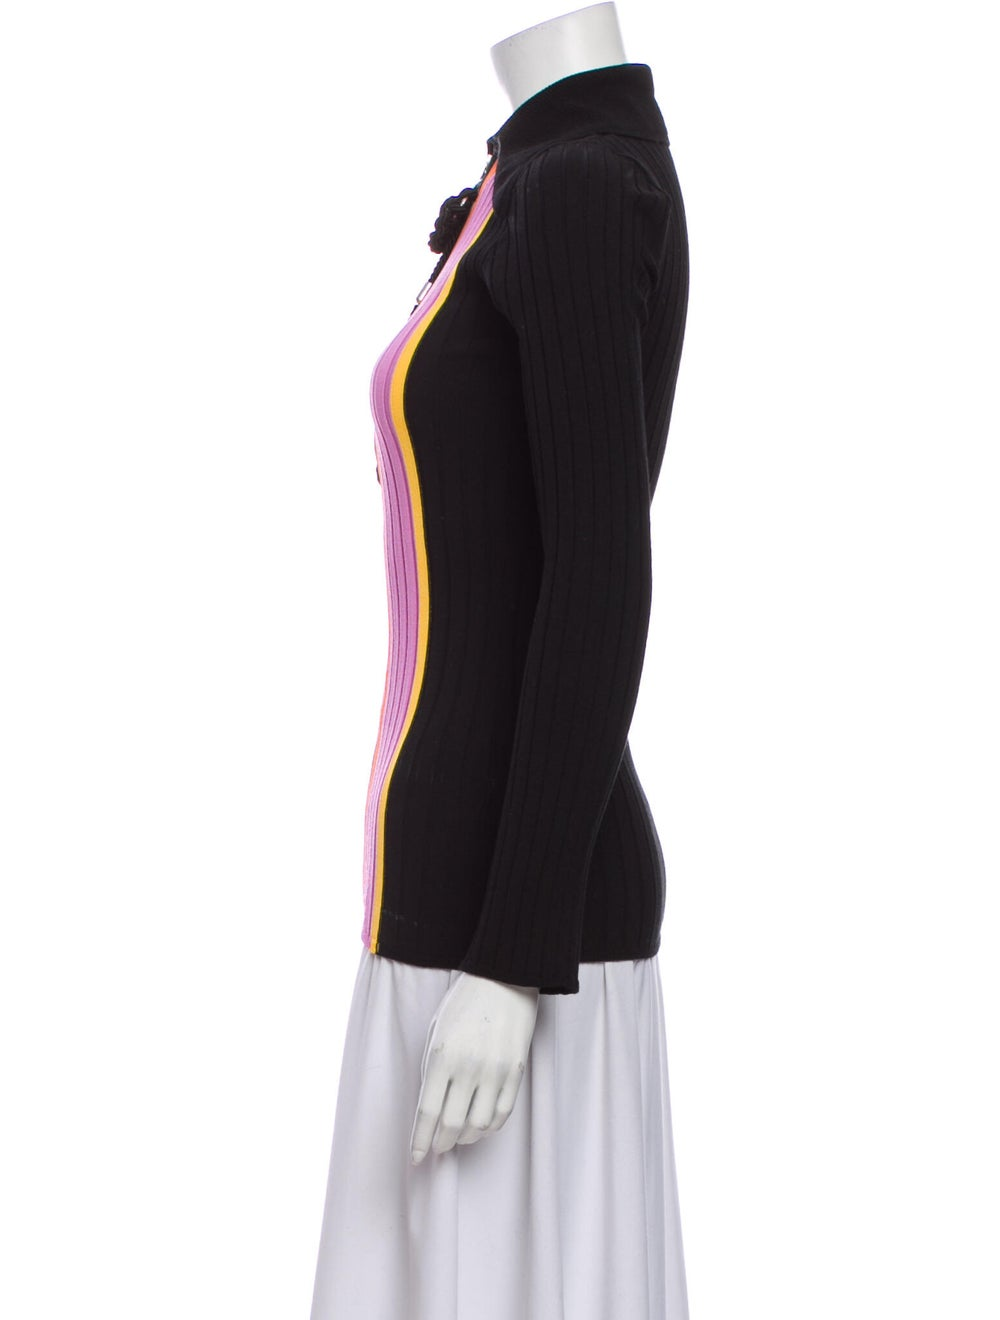 Ellery Striped Mock Neck Sweater Black - image 2